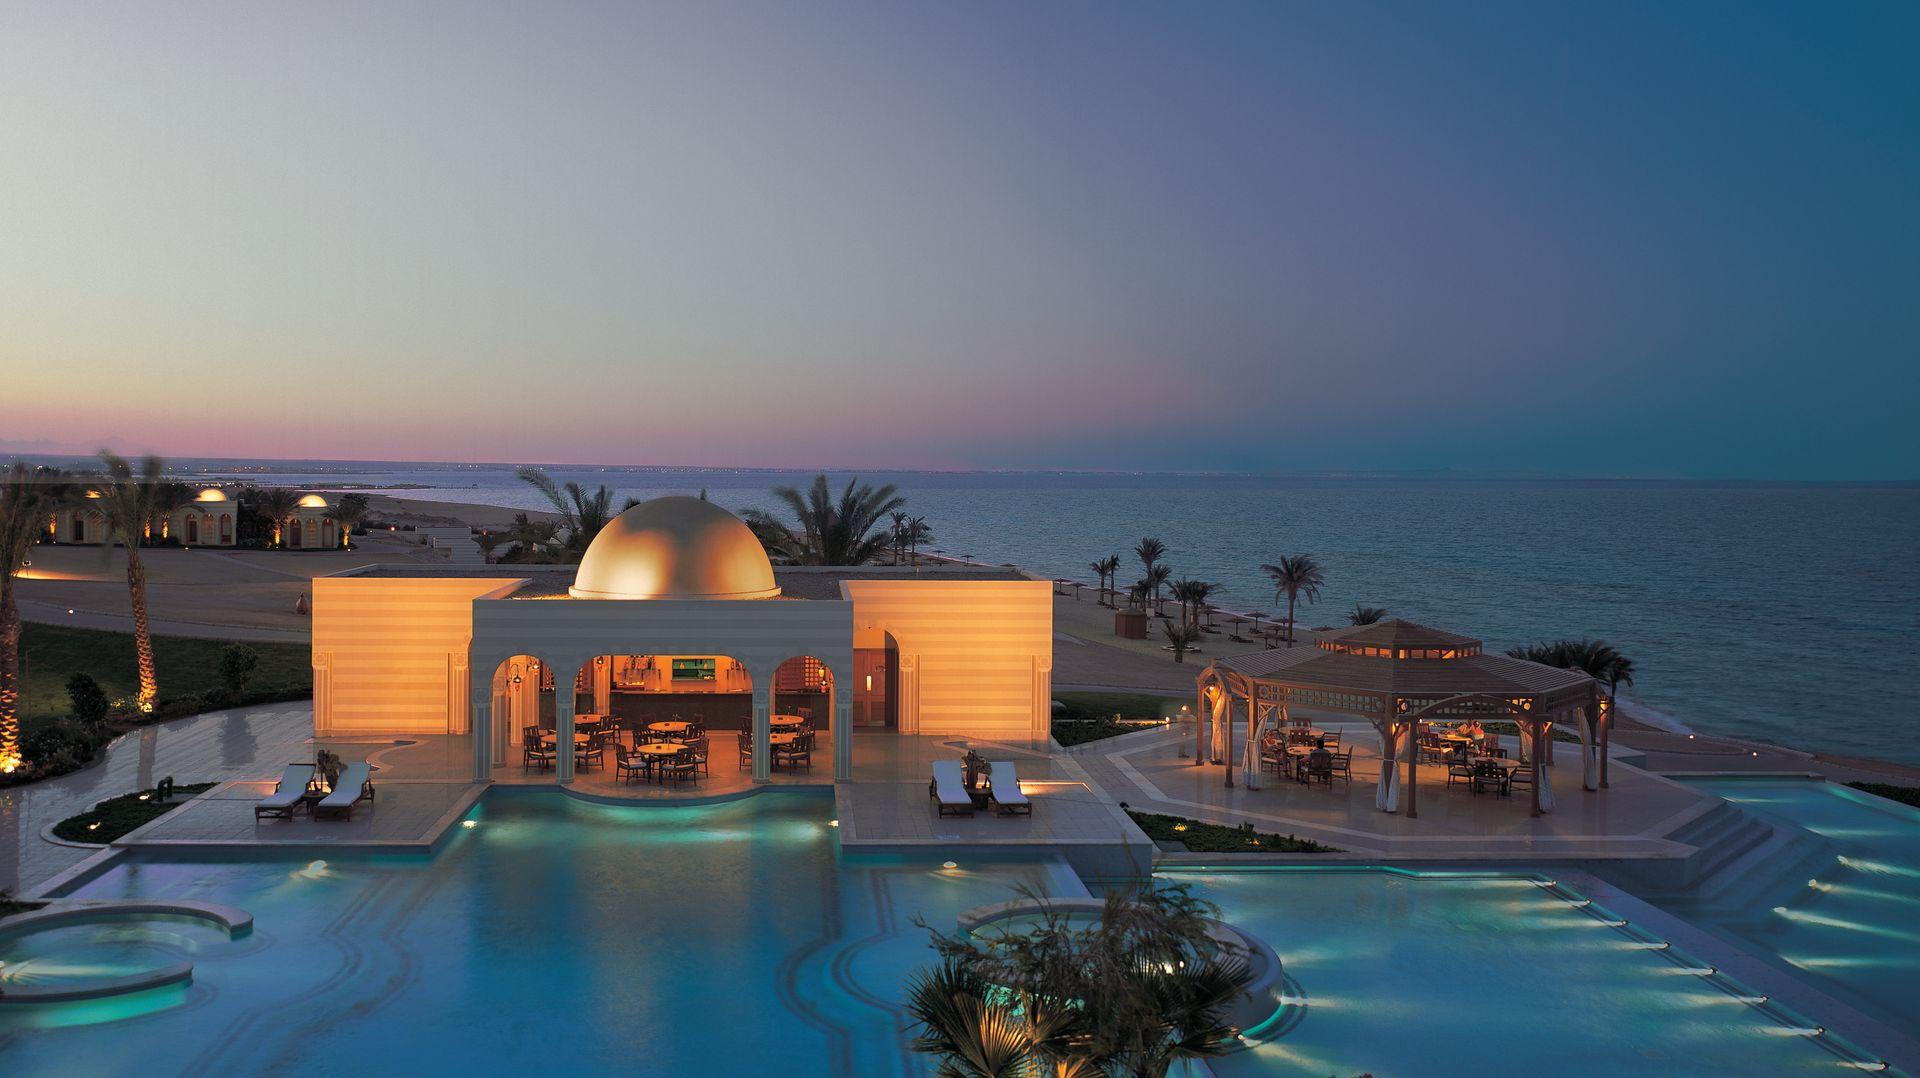 Oberoi sahl hasheesh hurghada egypt original diving - Dive inn resort egypt ...